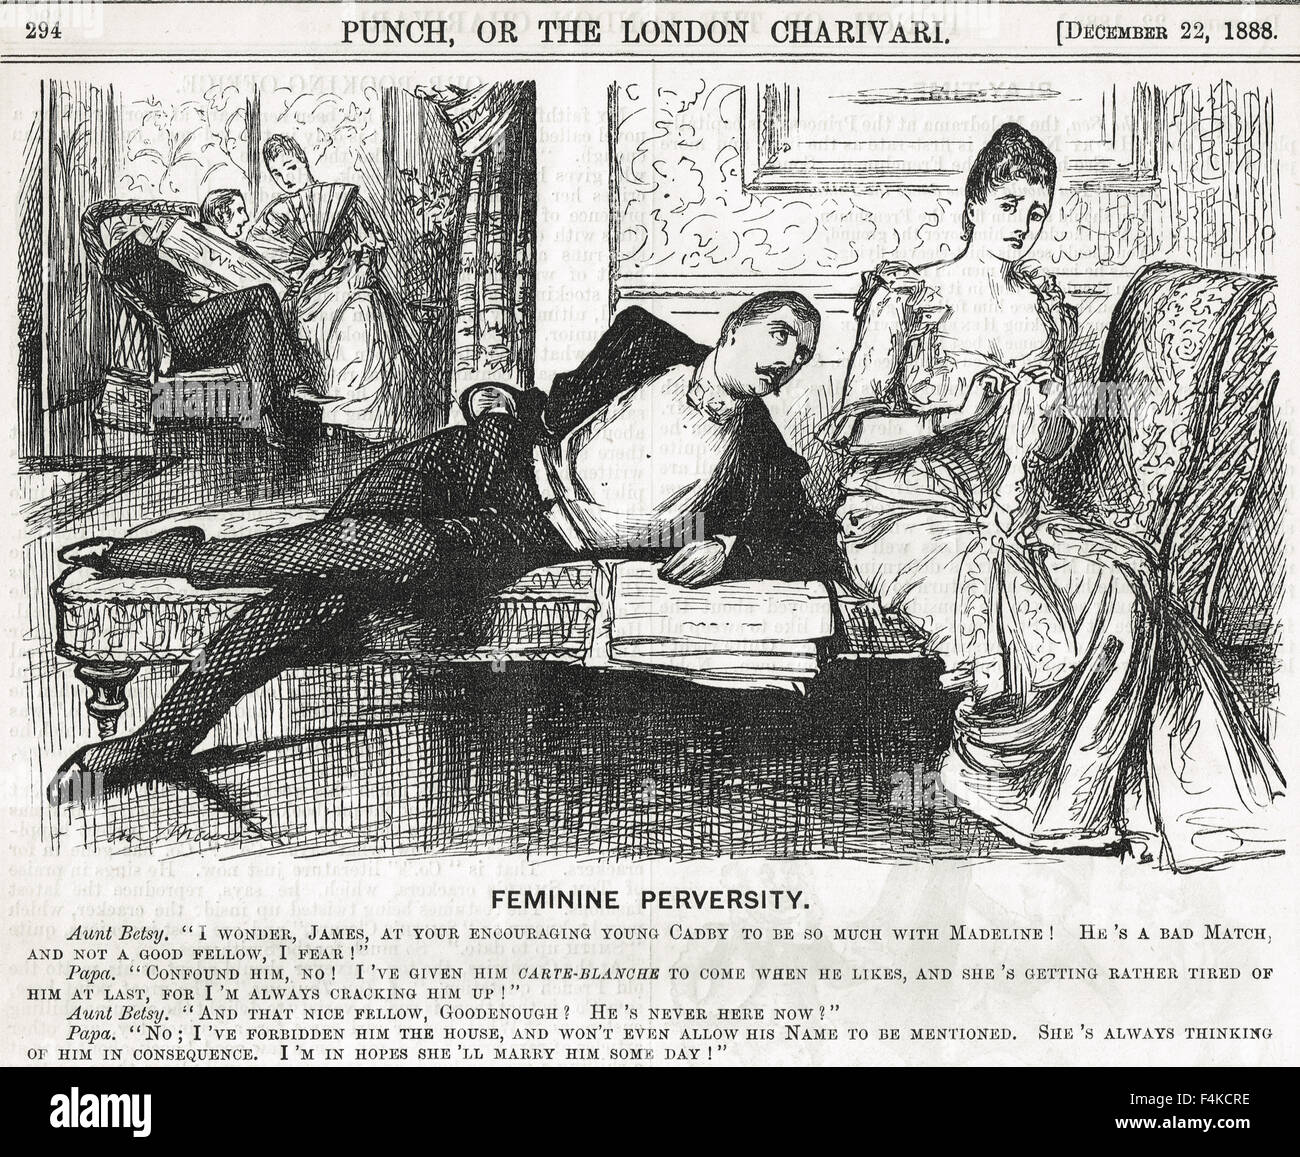 Reverse Psychology Punch Cartoon 1888 - Stock Image